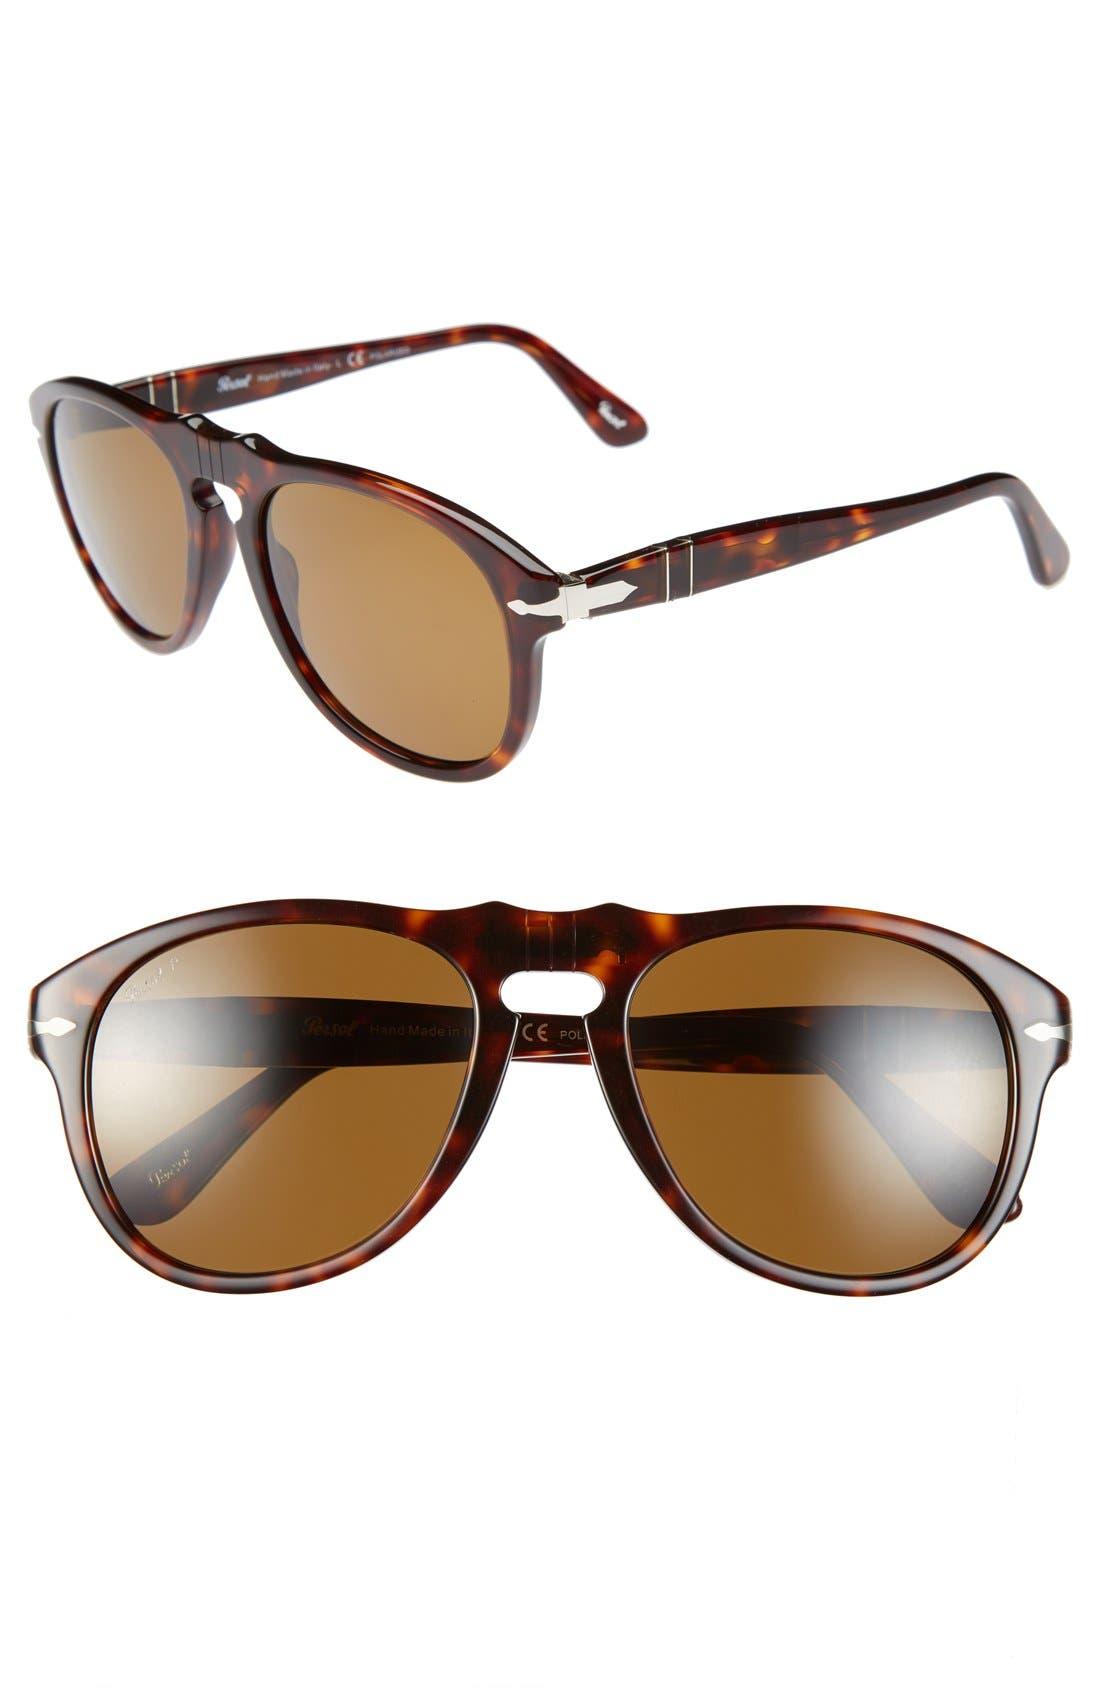 Persol 54mm Polarized Keyhole Retro Sunglasses